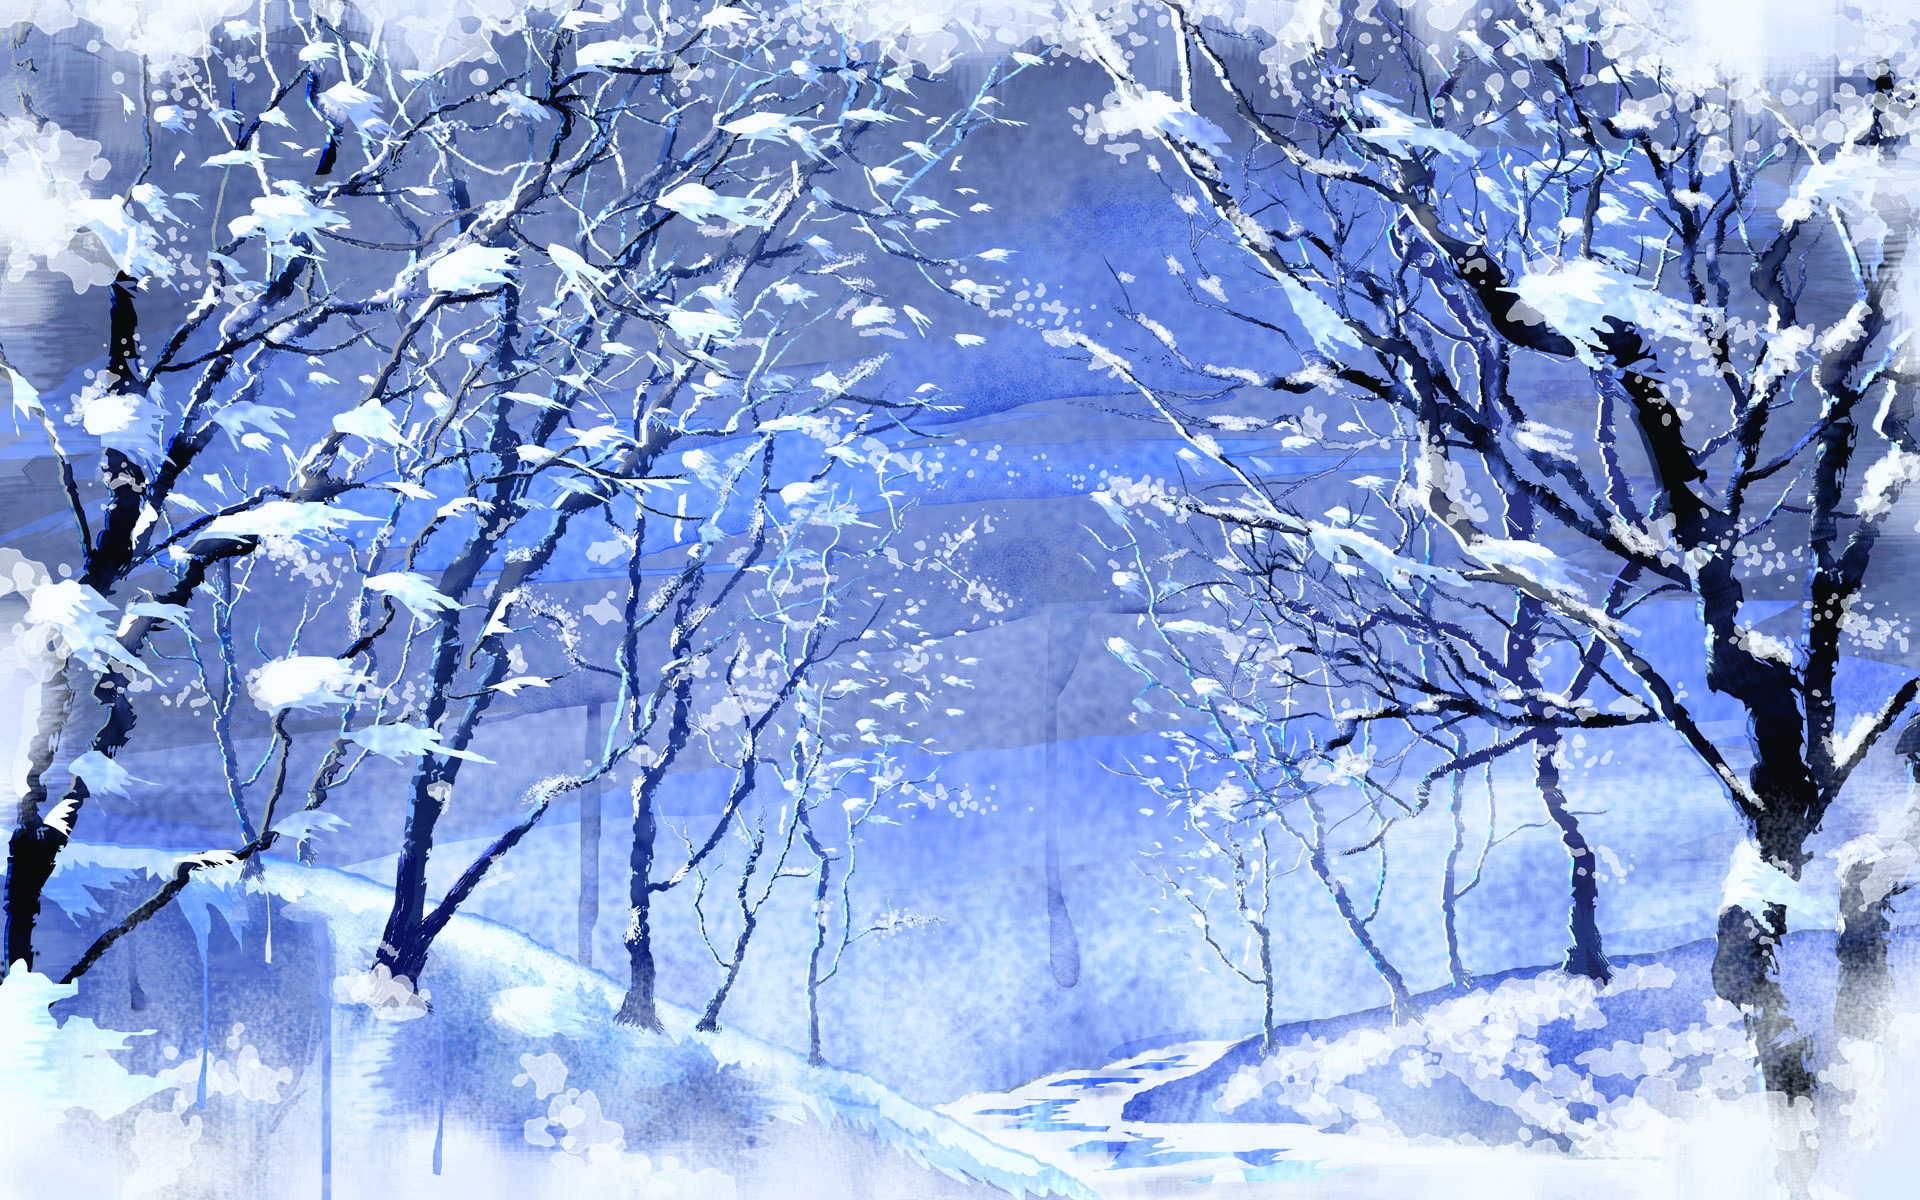 Winter Screensavers for Windows 7 wallpaper wallpaper hd 1920x1200